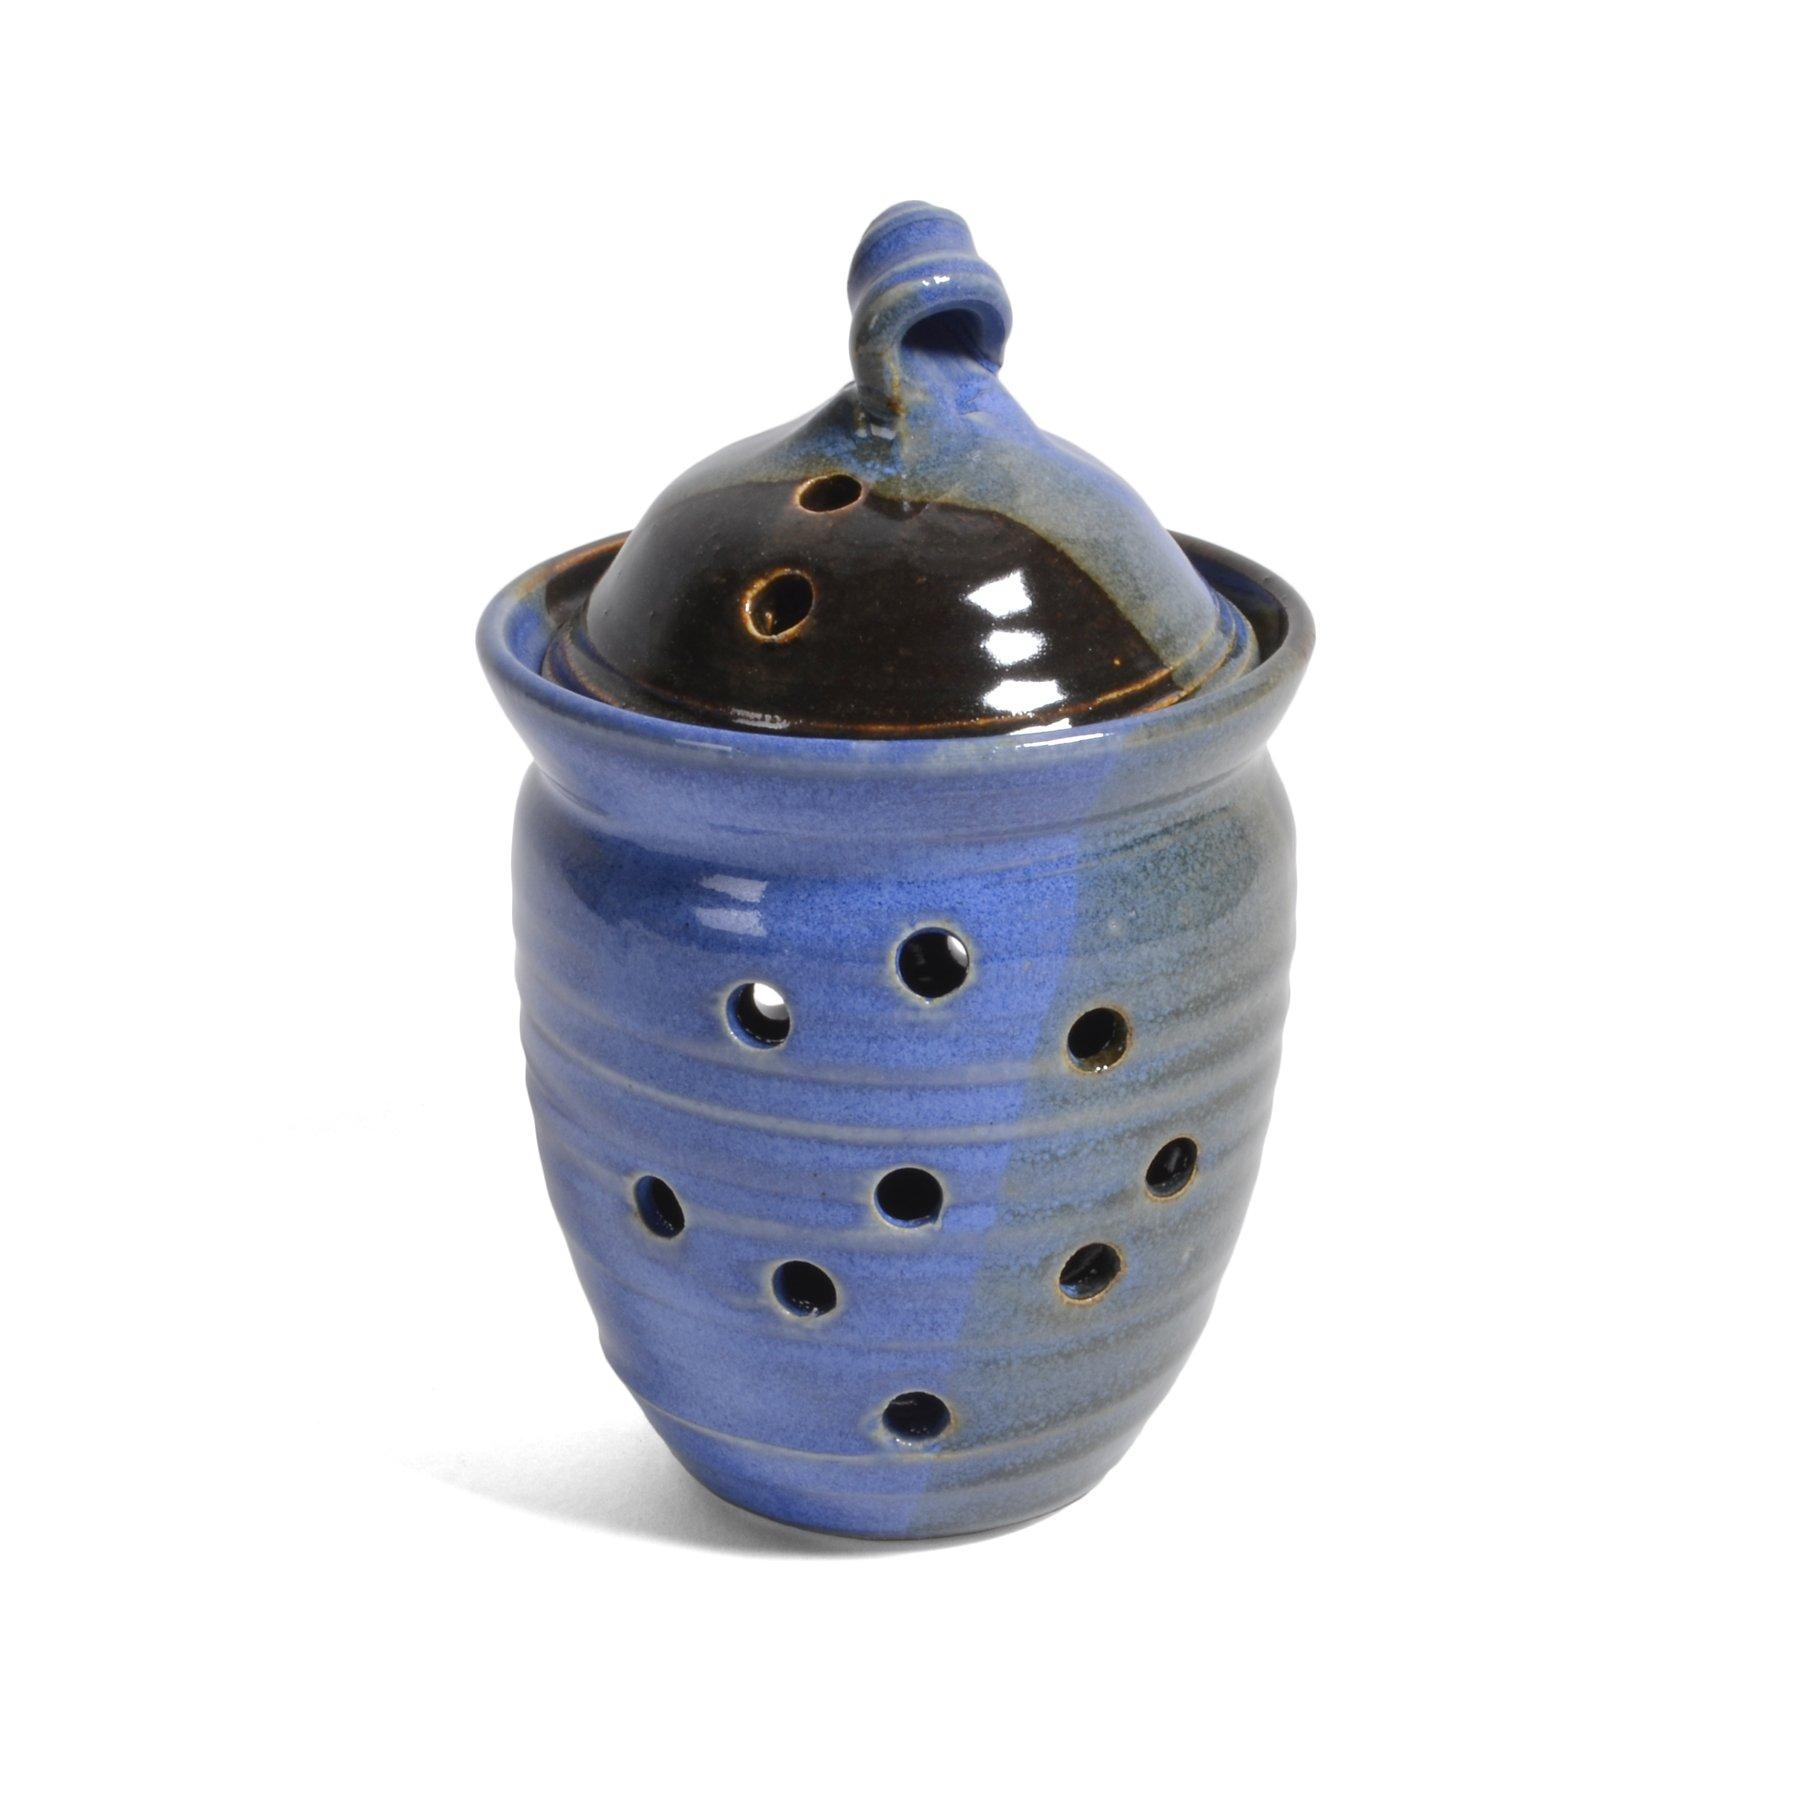 Holman Pottery Garlic Keeper Jar, Blue Earth by Holman Pottery